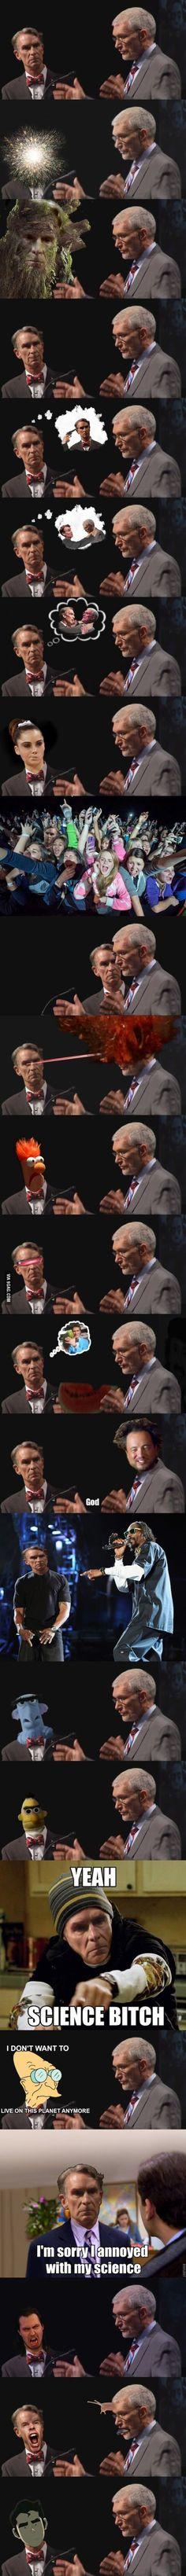 Bill Nye the many face guy.